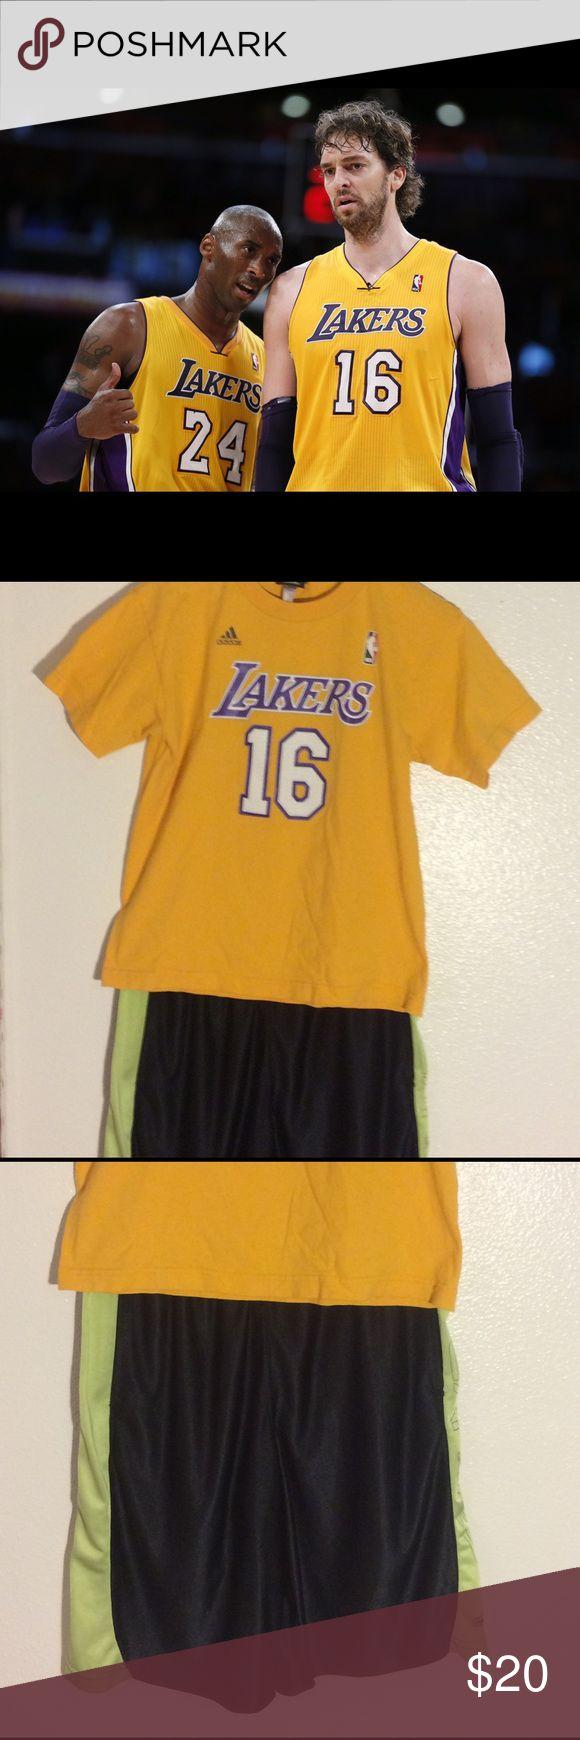 🏀LA Lakers Shirt and Shorts Combo🏀 🏀Adidas Lakers Youth Large Shirt with Net lettering. Lakers NBA Shorts Size Medium🏀 Adidas Matching Sets